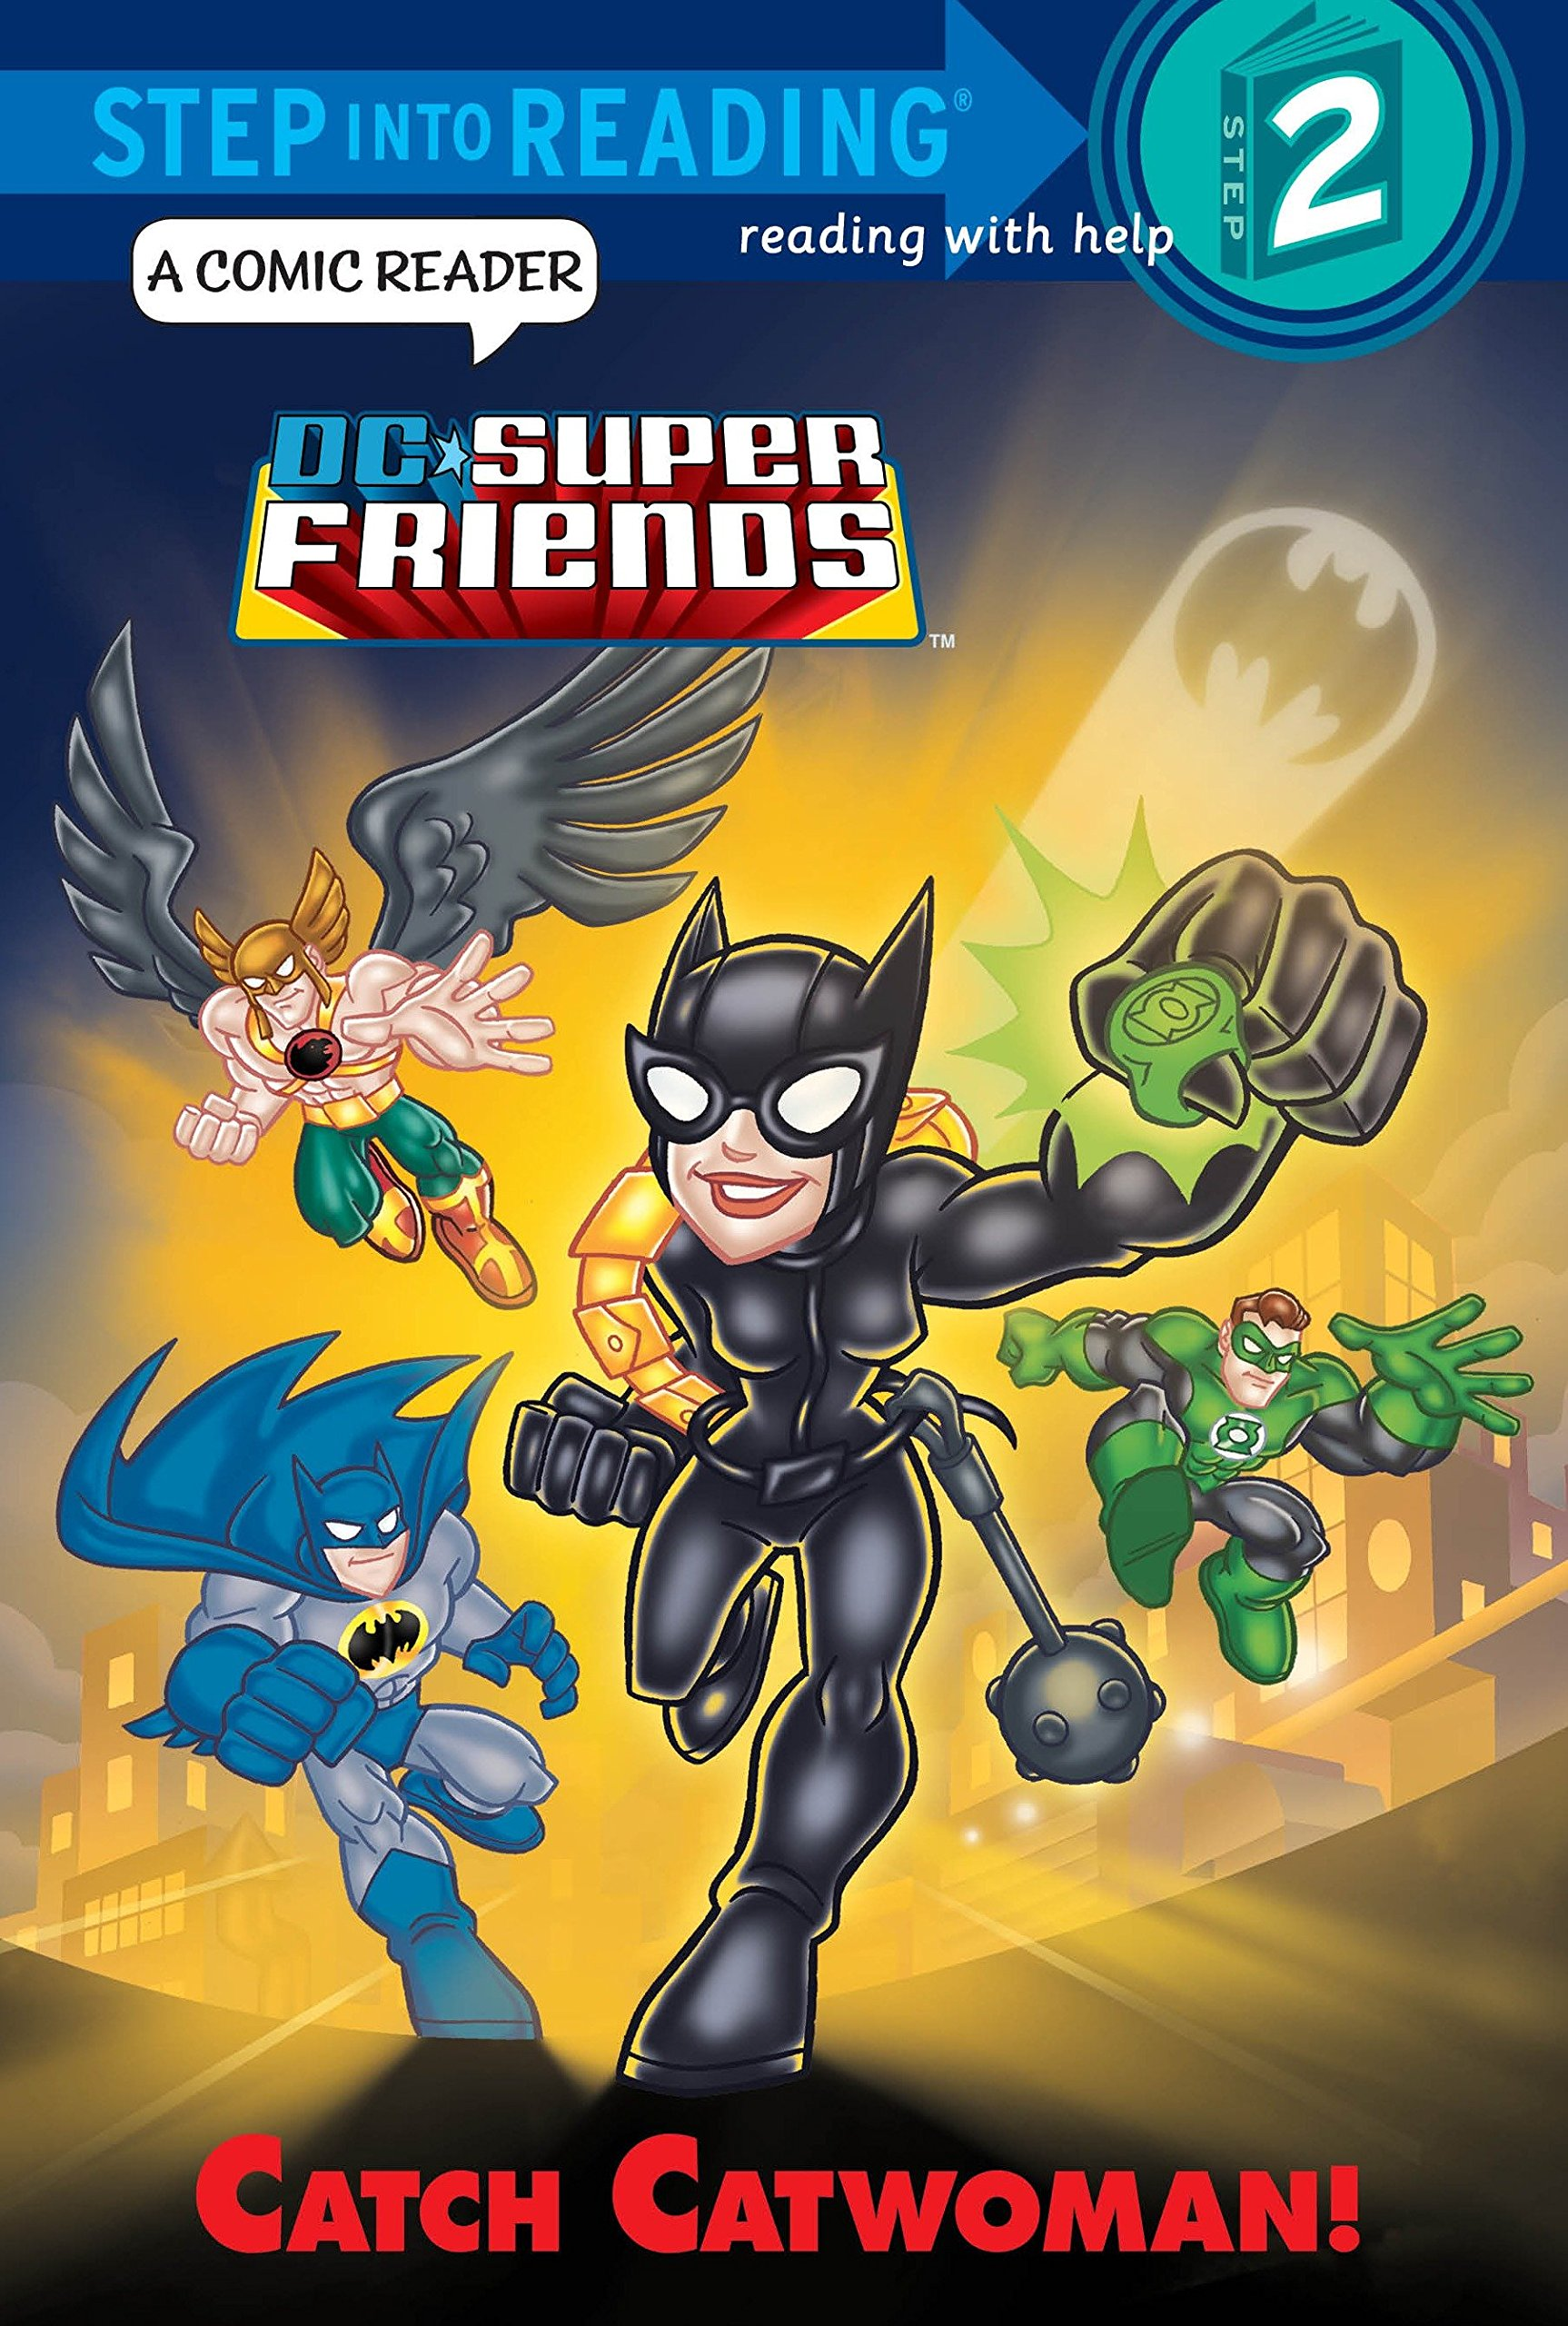 DC Super-Friends: Catch Catwoman!